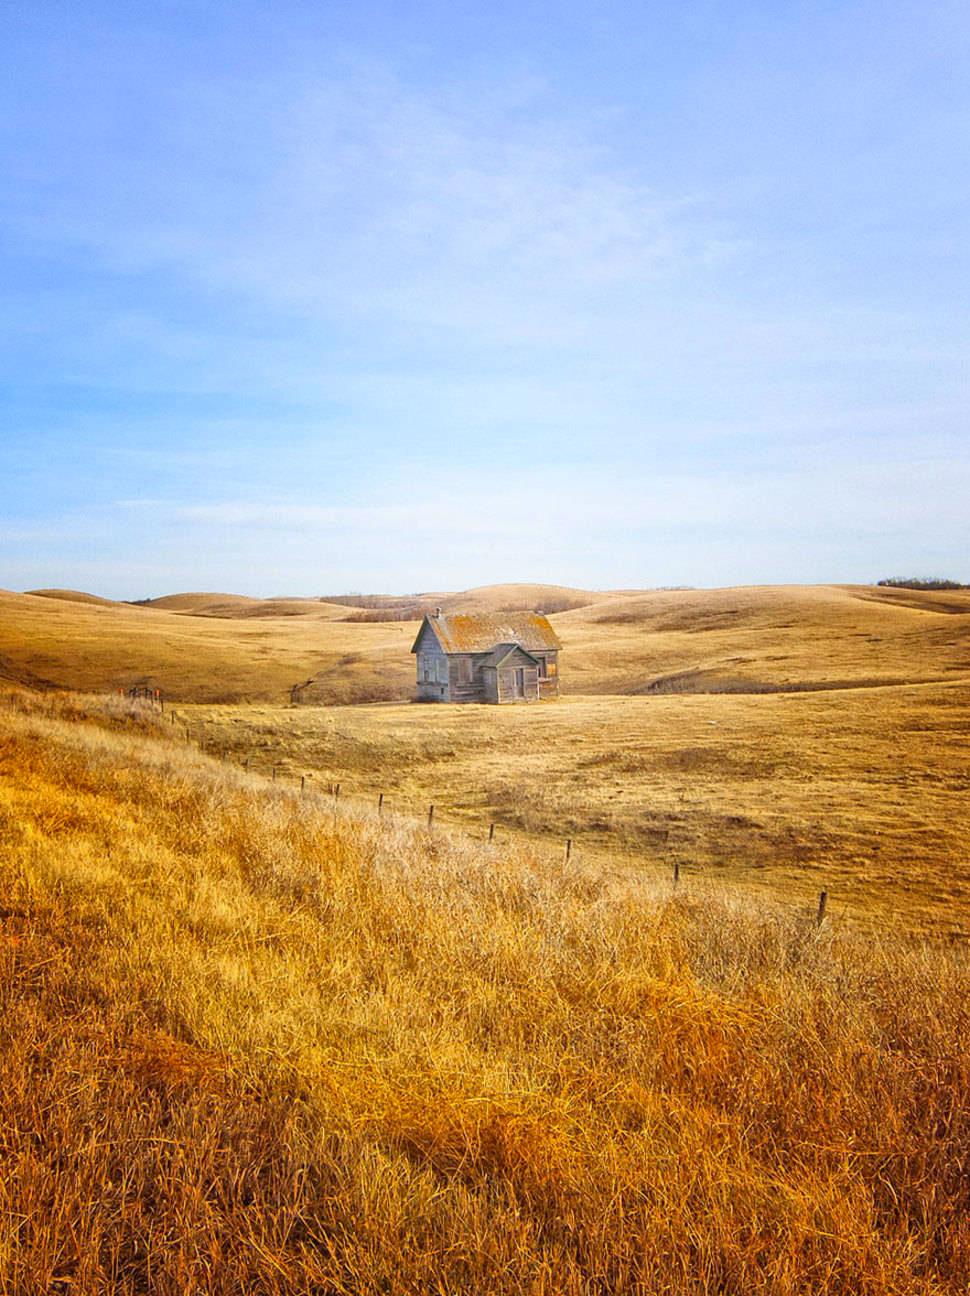 Золотые поля, Альберта, Канада